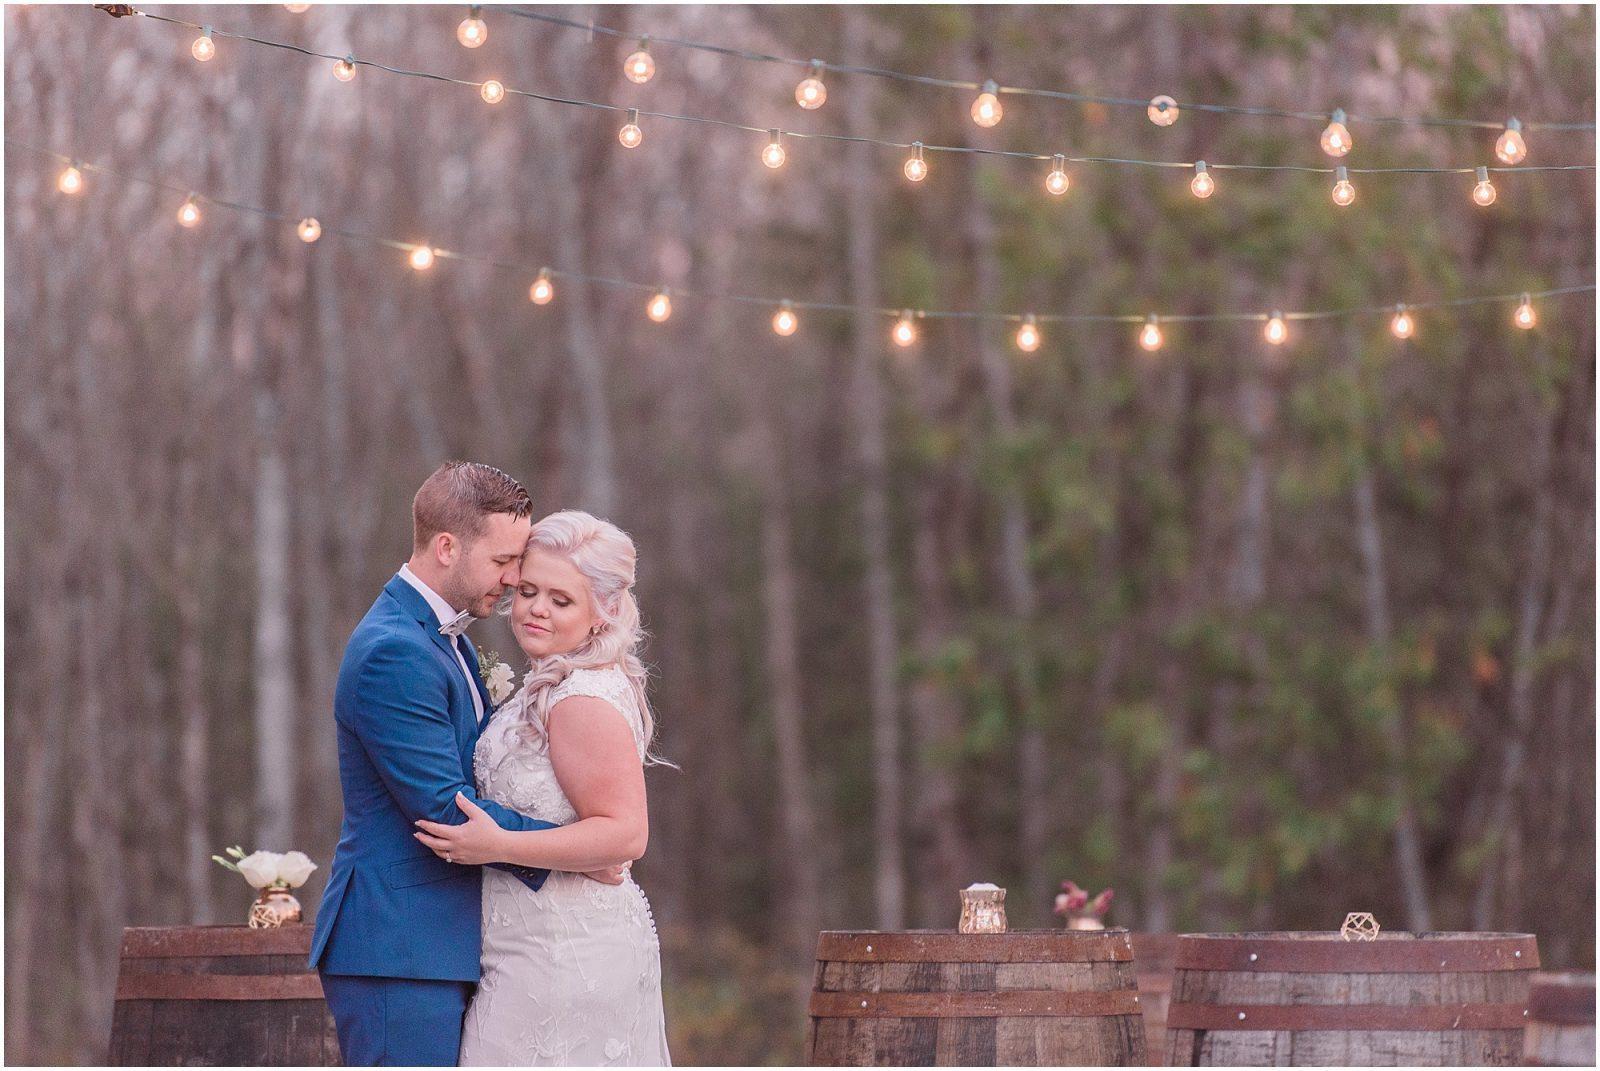 0083 Bethany and Luc - Fall Backyard Ottawa Wedding - Copper and Navy - PhotosbyEmmaH.jpg